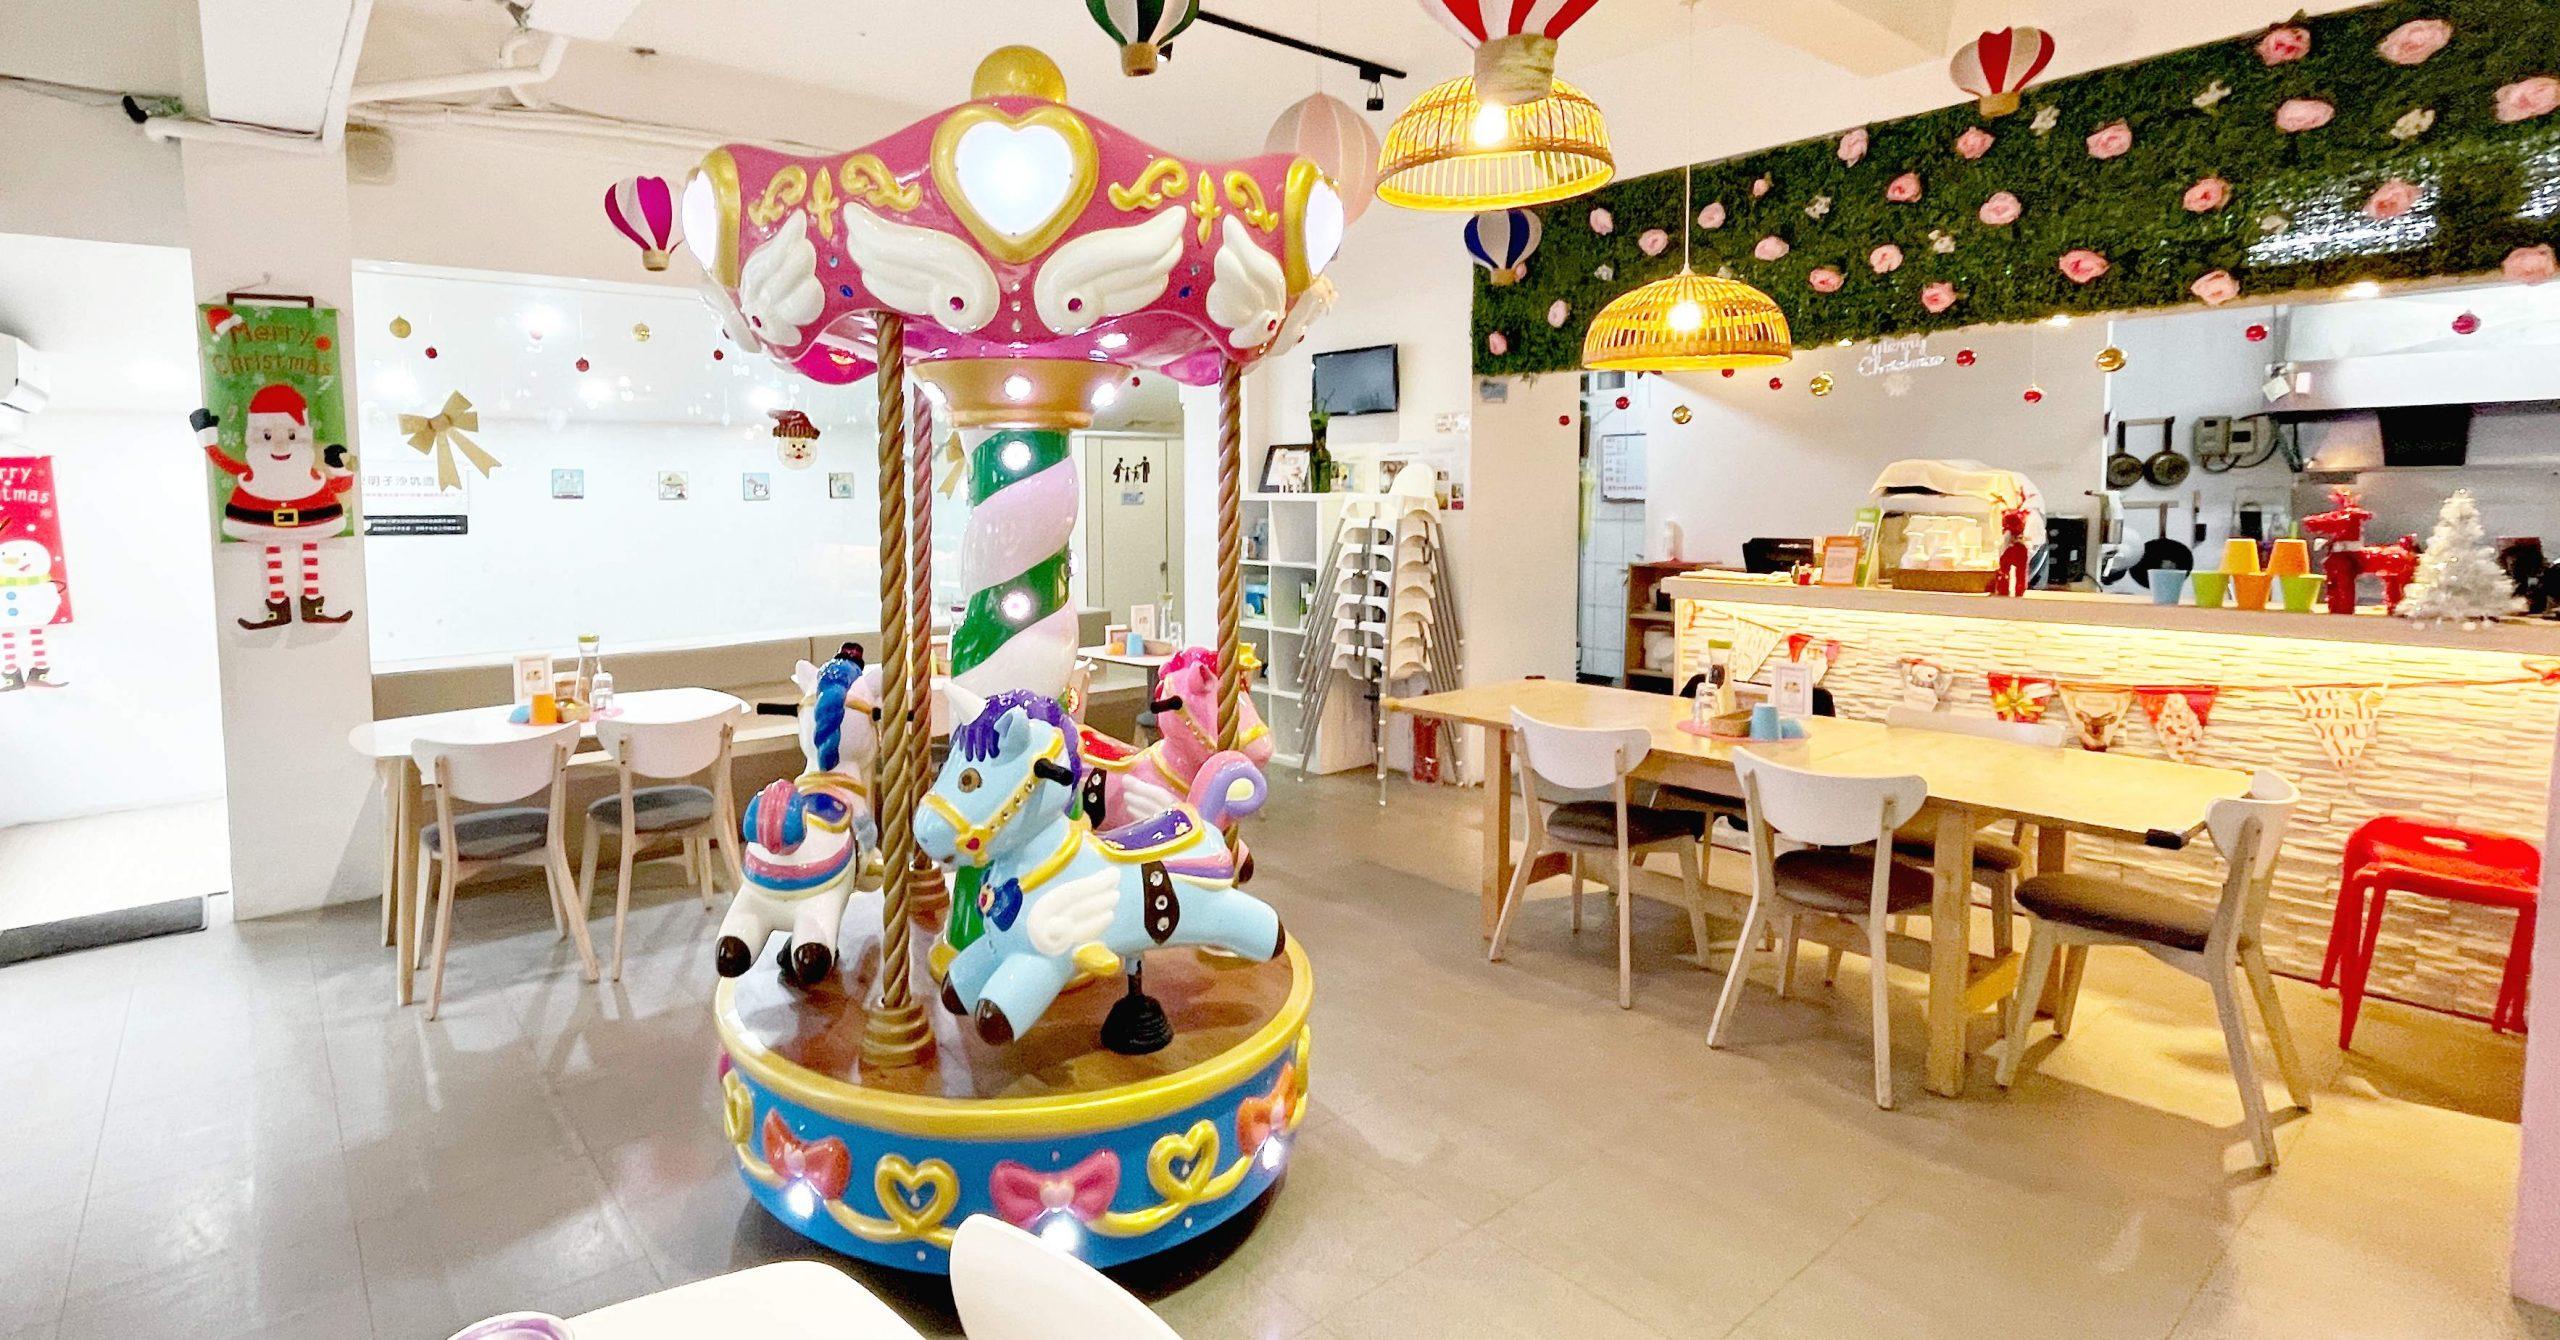 中和親子餐廳,BabyWonderland童話世界親子空間,BabyWonderland @Nash,神之領域